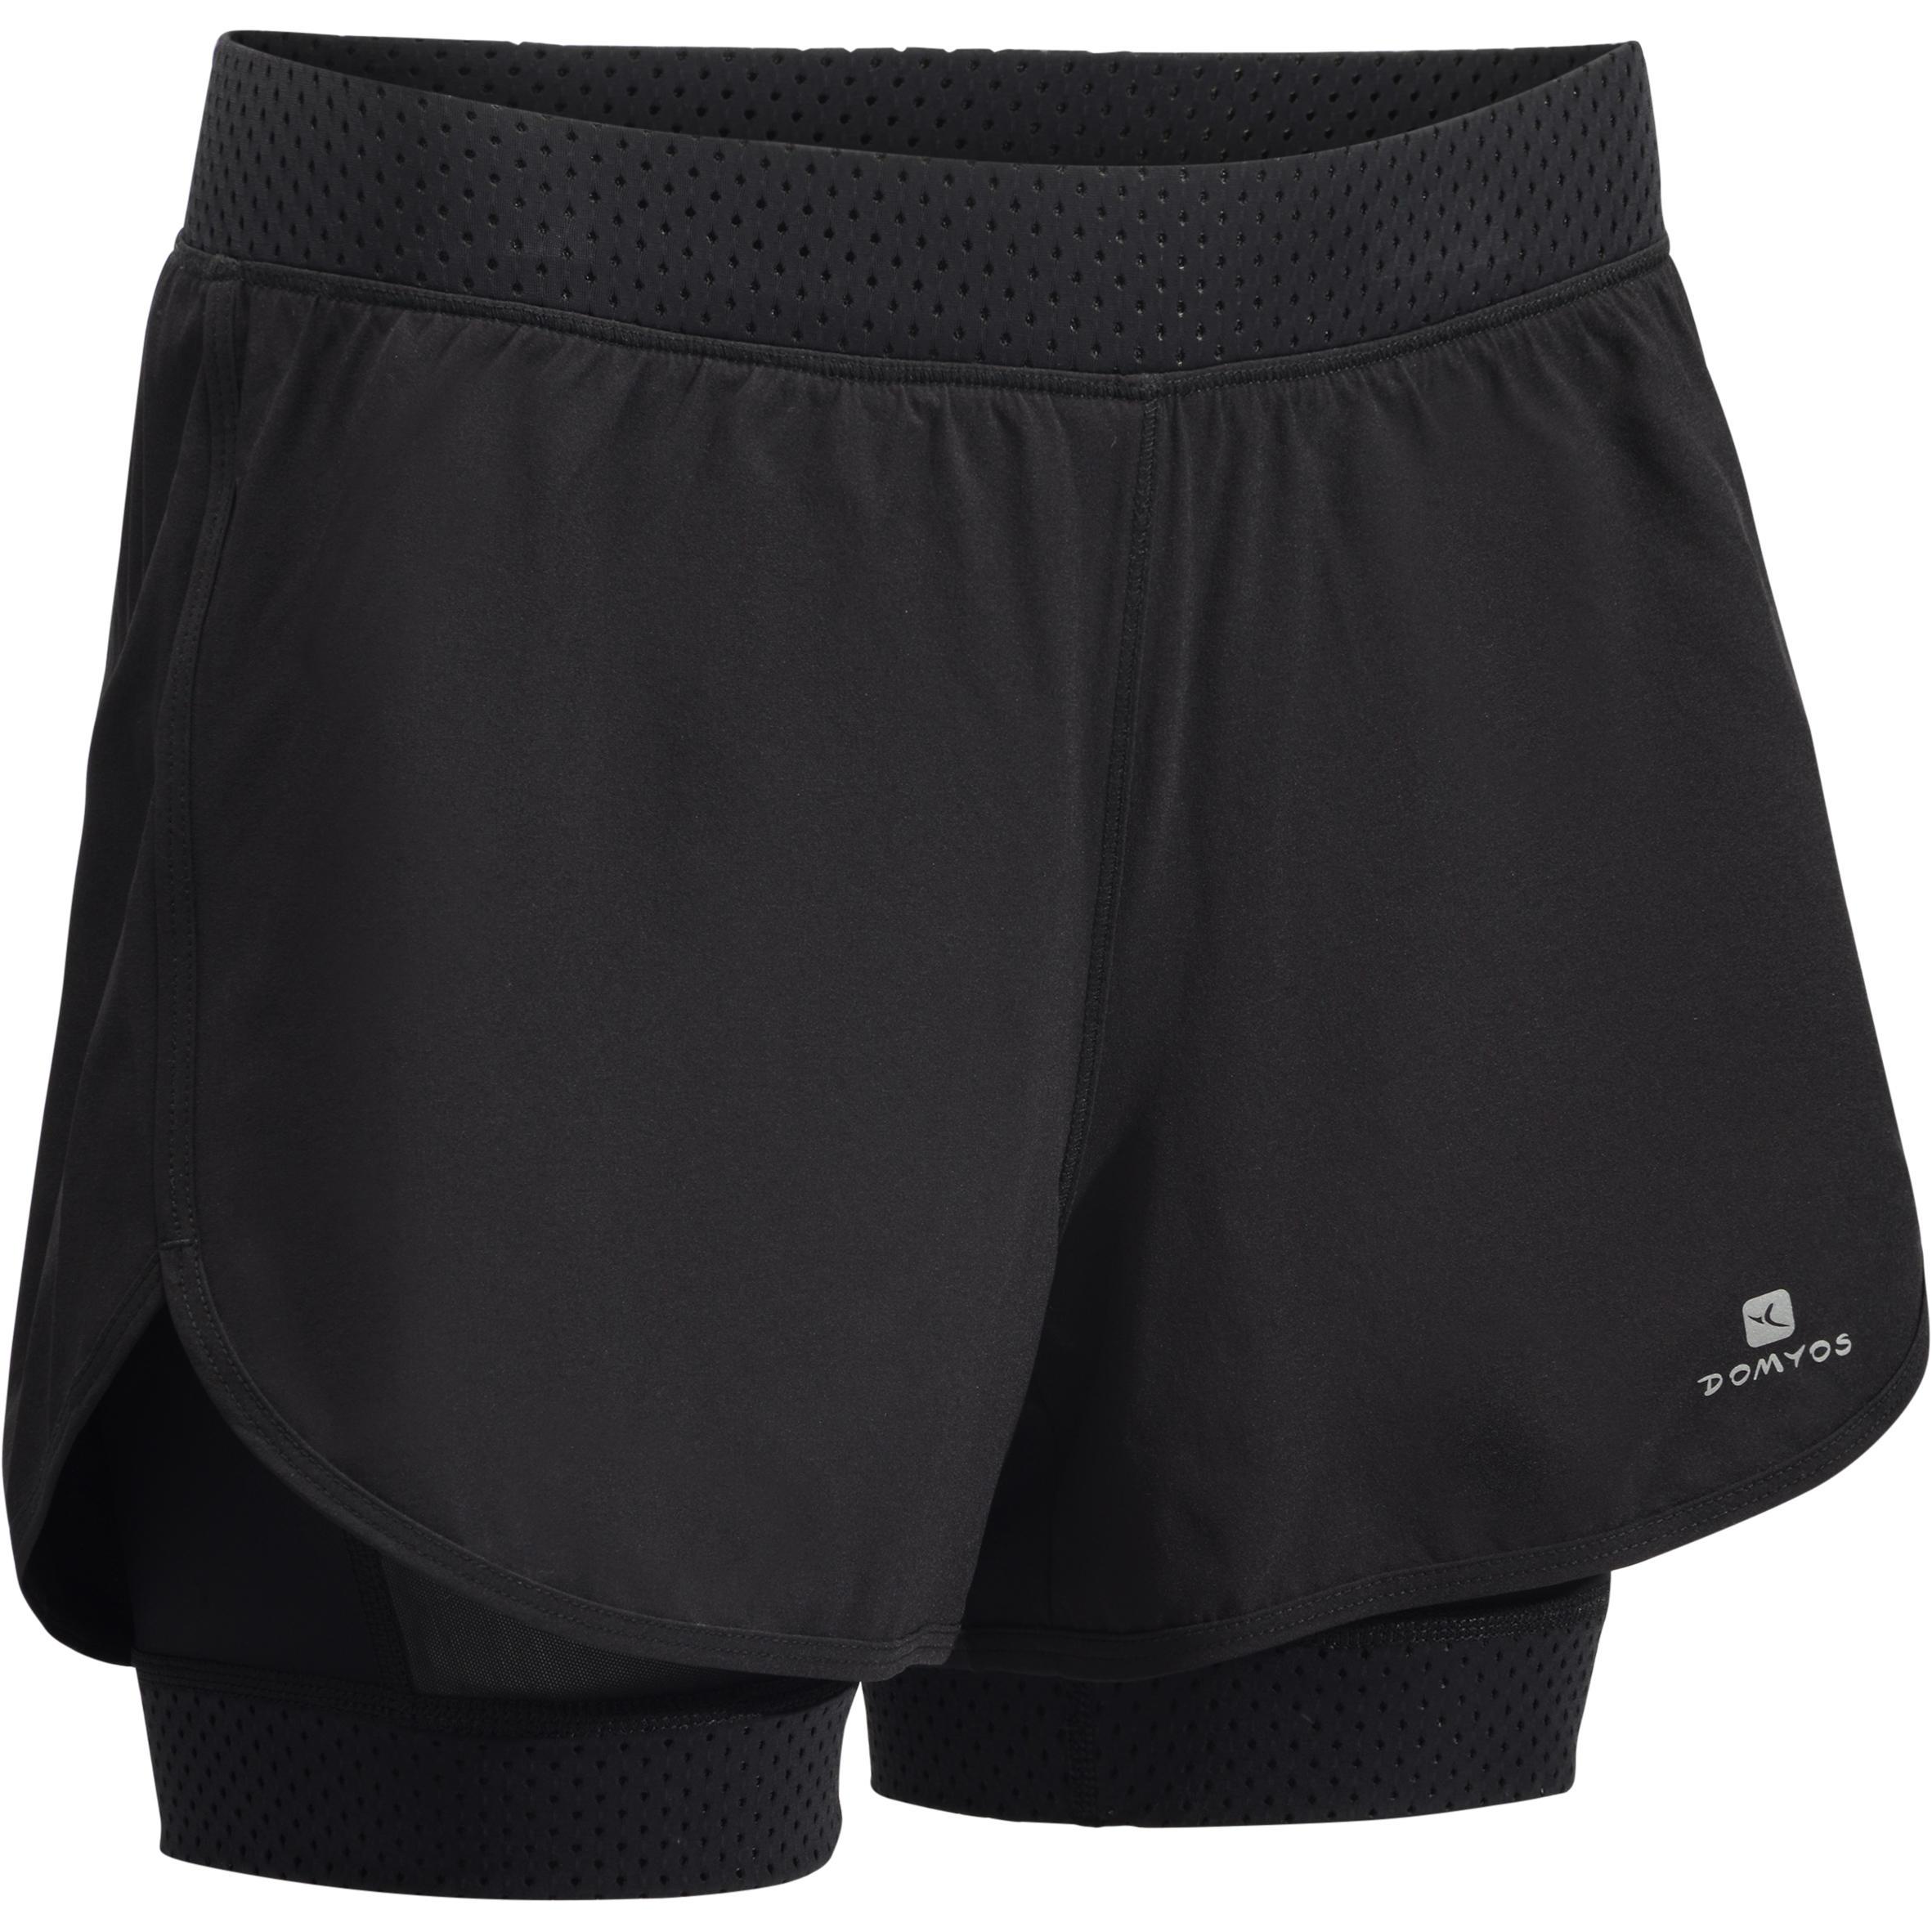 900 Women's 2-in-1 Cardio Shorts - Black